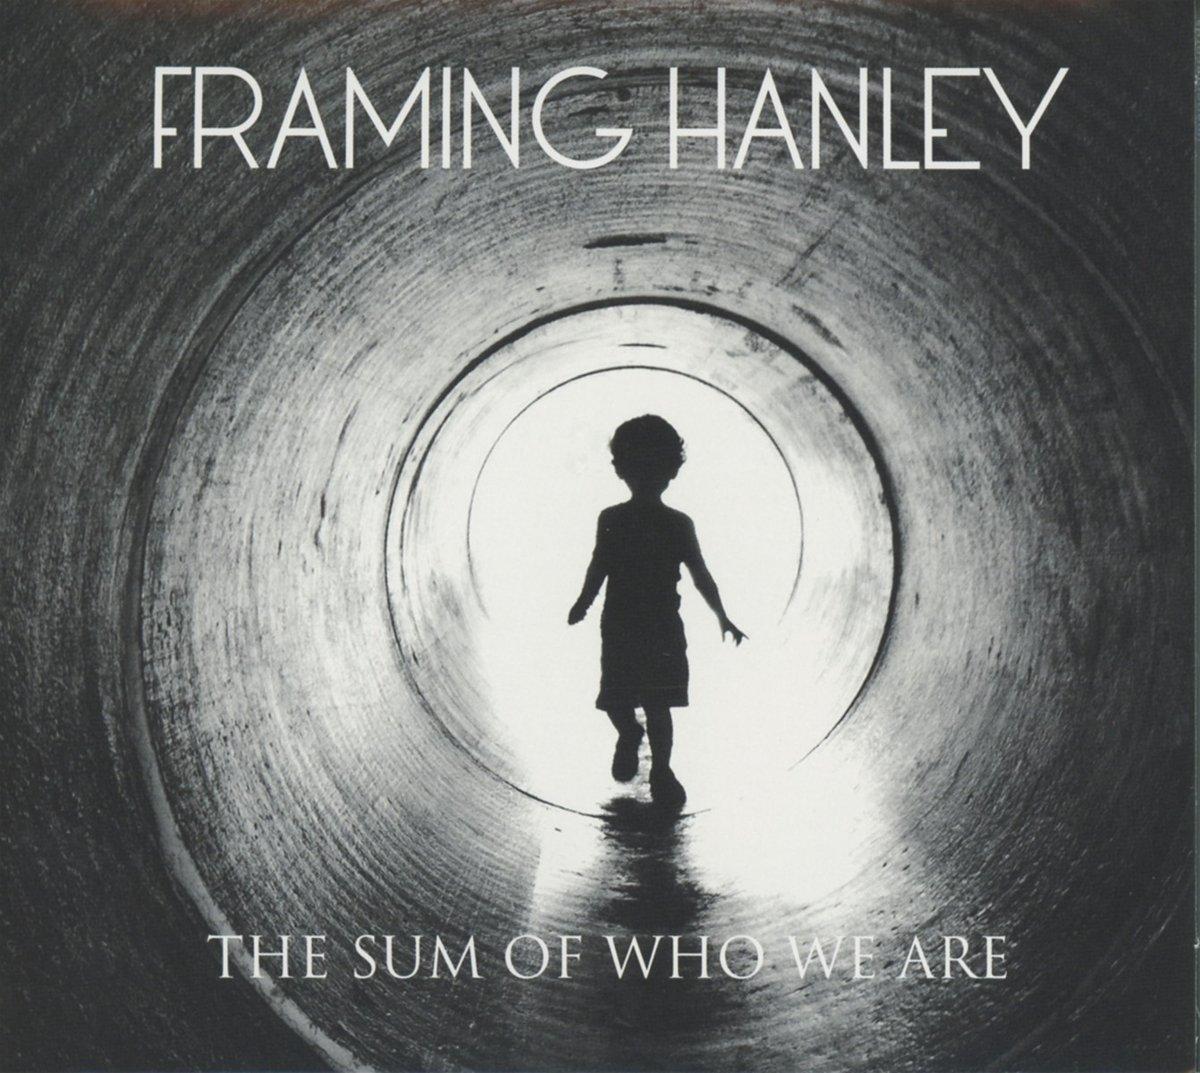 Framing Hanley - Sum of Who We Are - Amazon.com Music